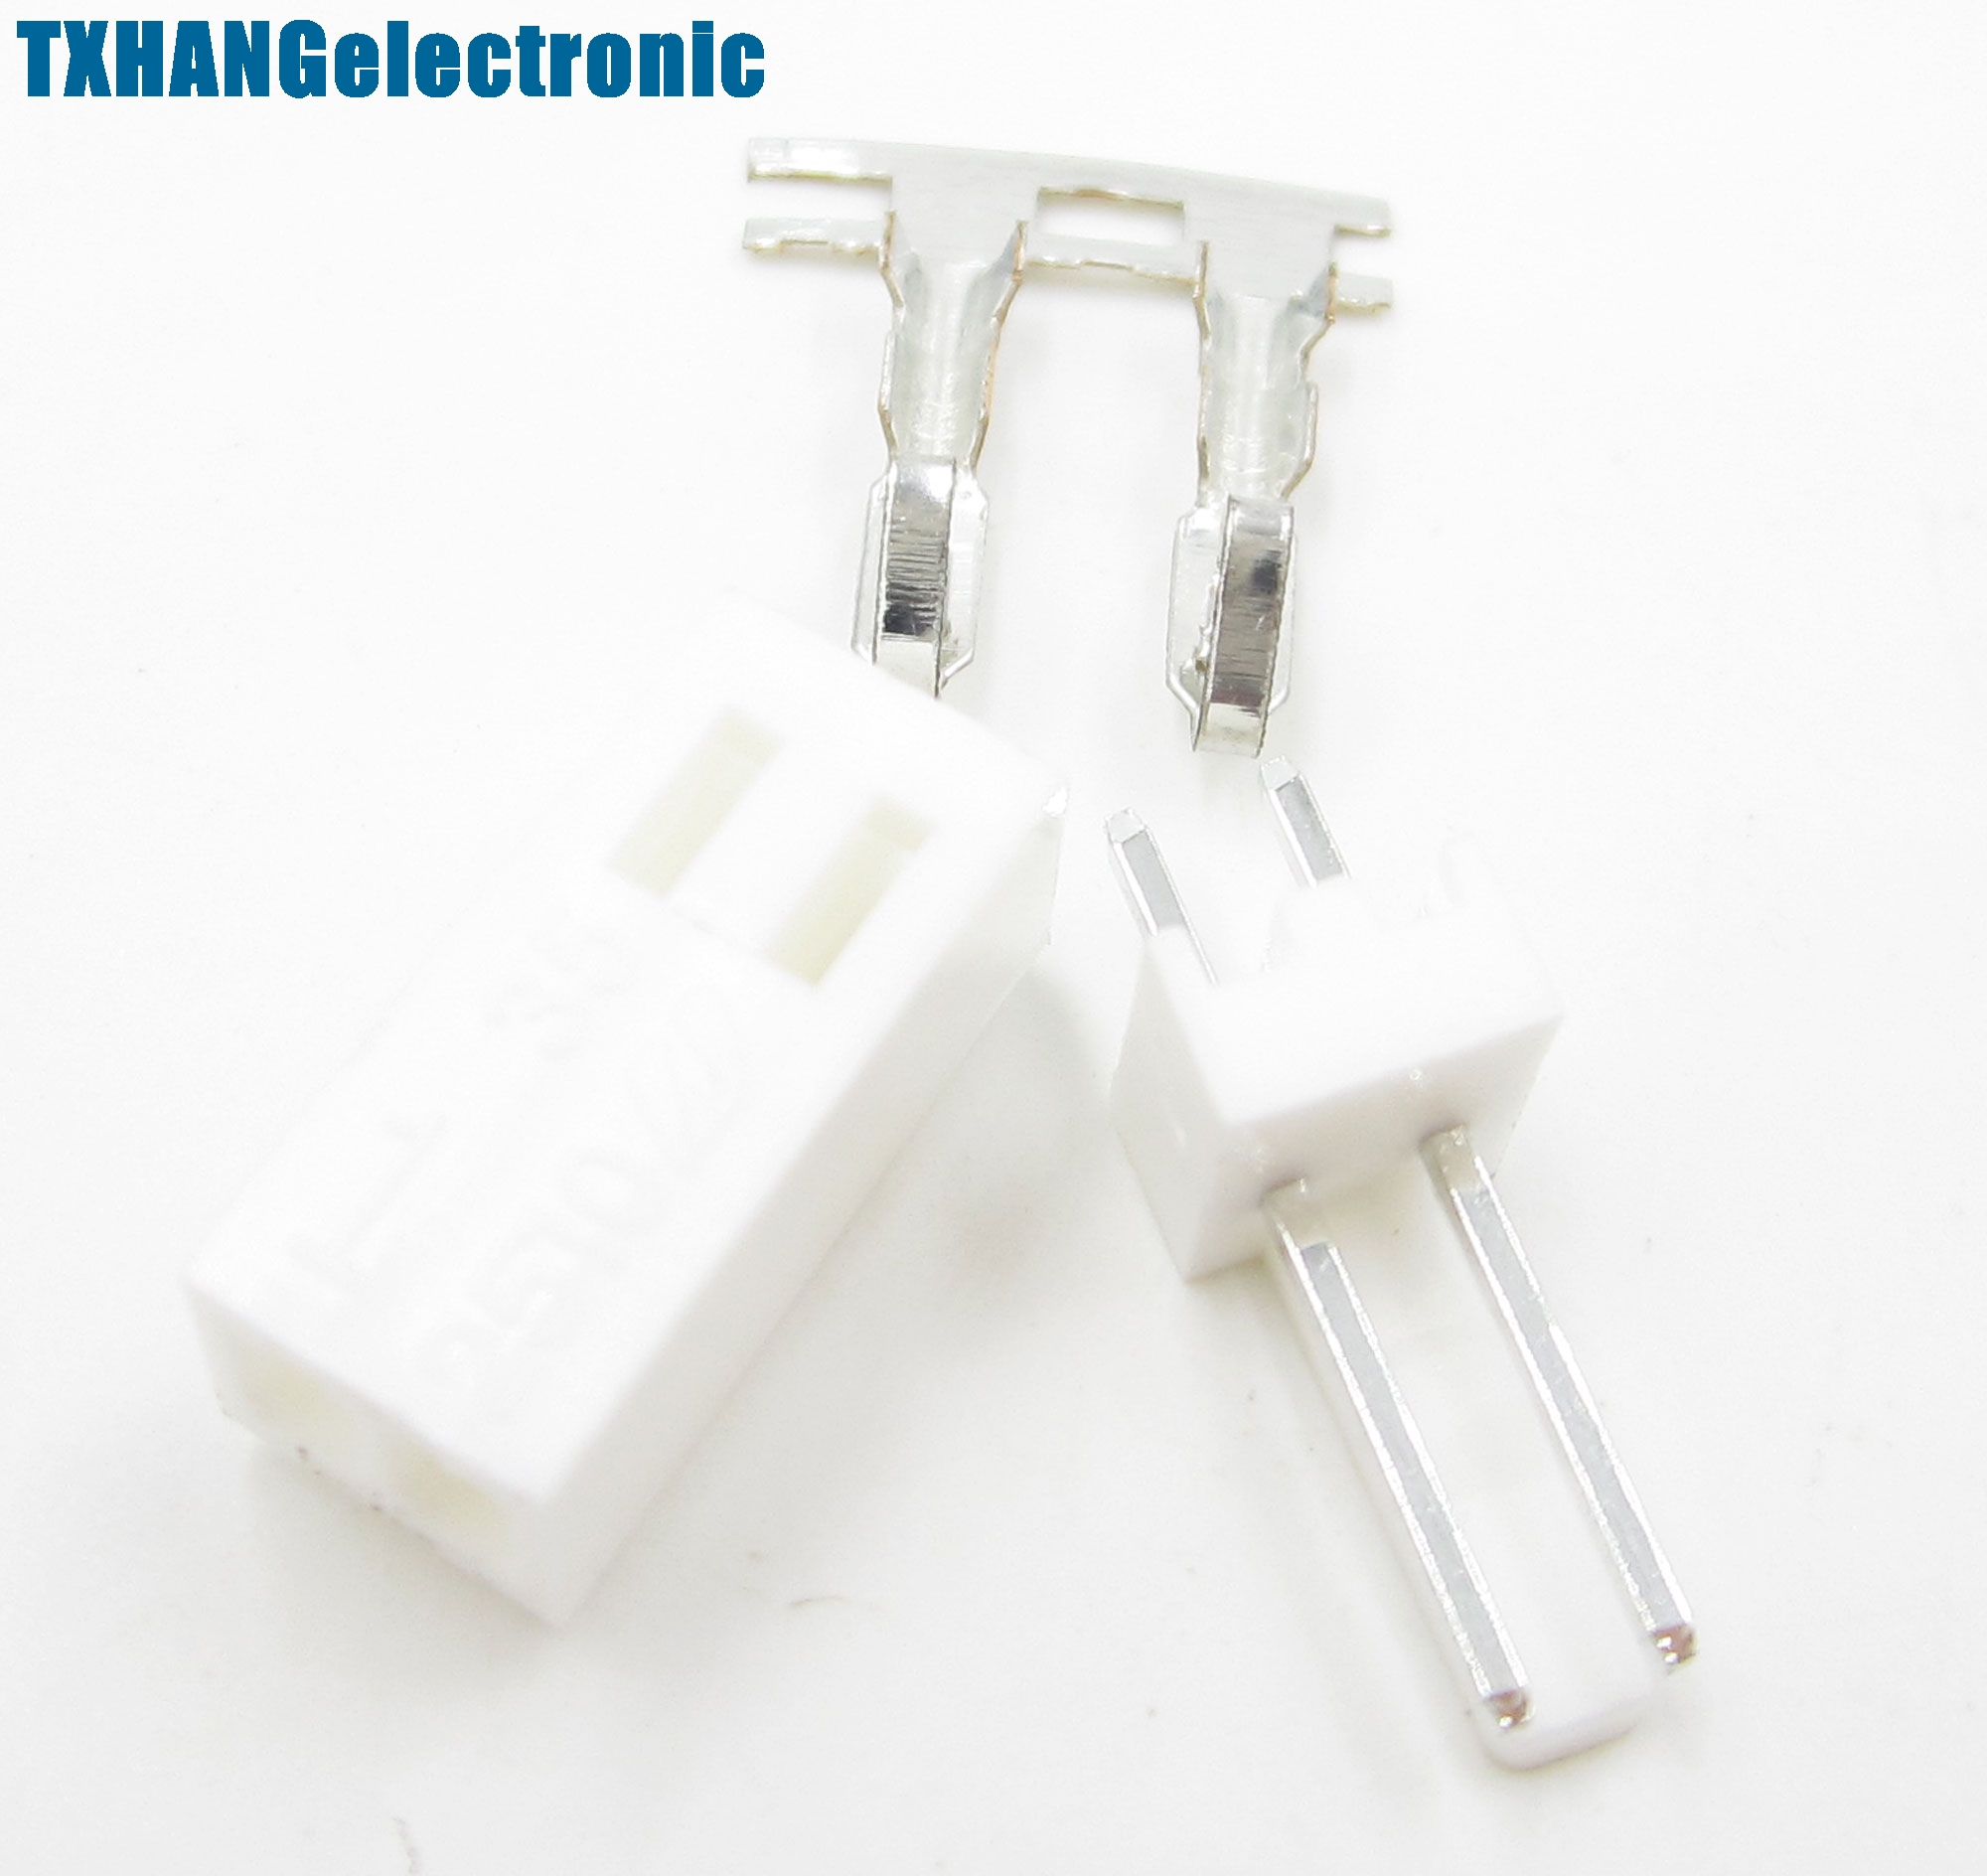 Housing Connector Kit  New 10PCS KF2510-2P 2.54mm Pin Header Terminal